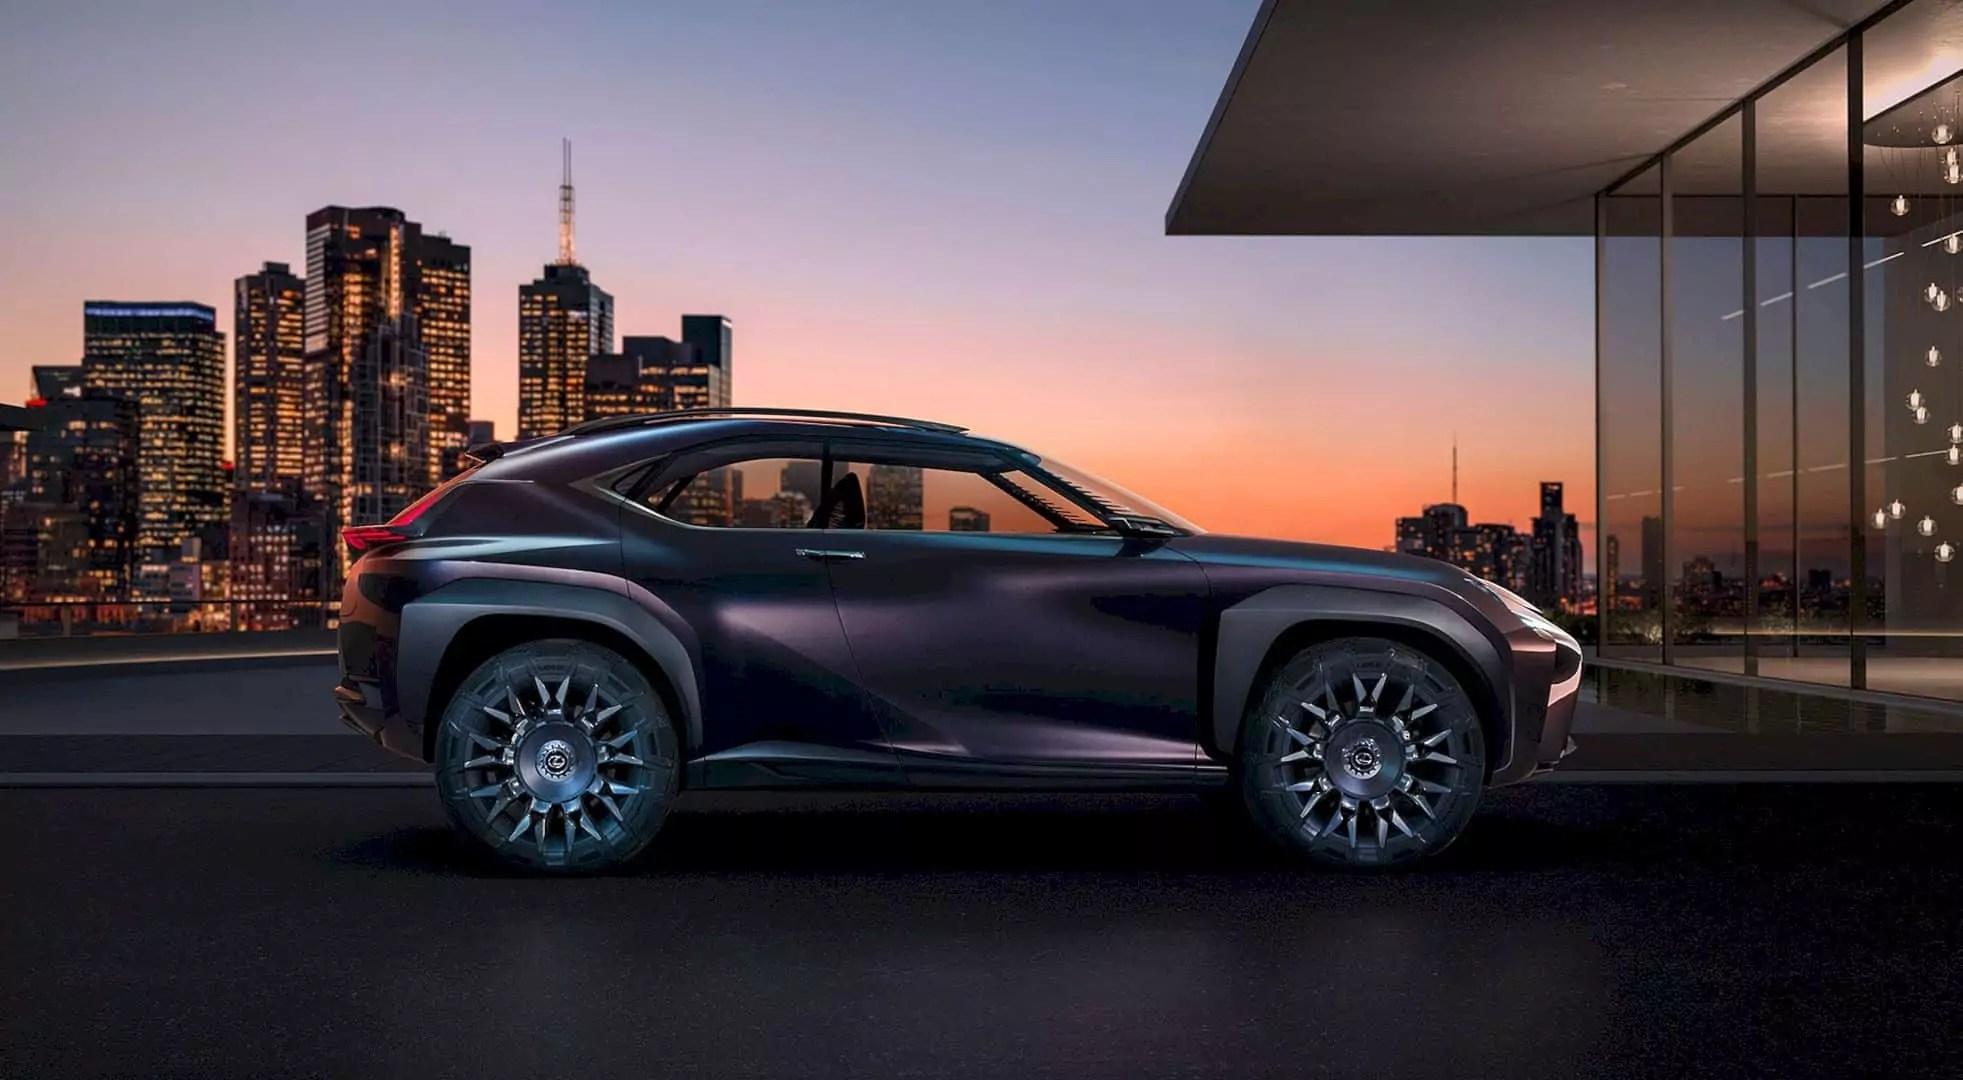 Lexus Concept Car Code UX: A Futuristic Inside Out